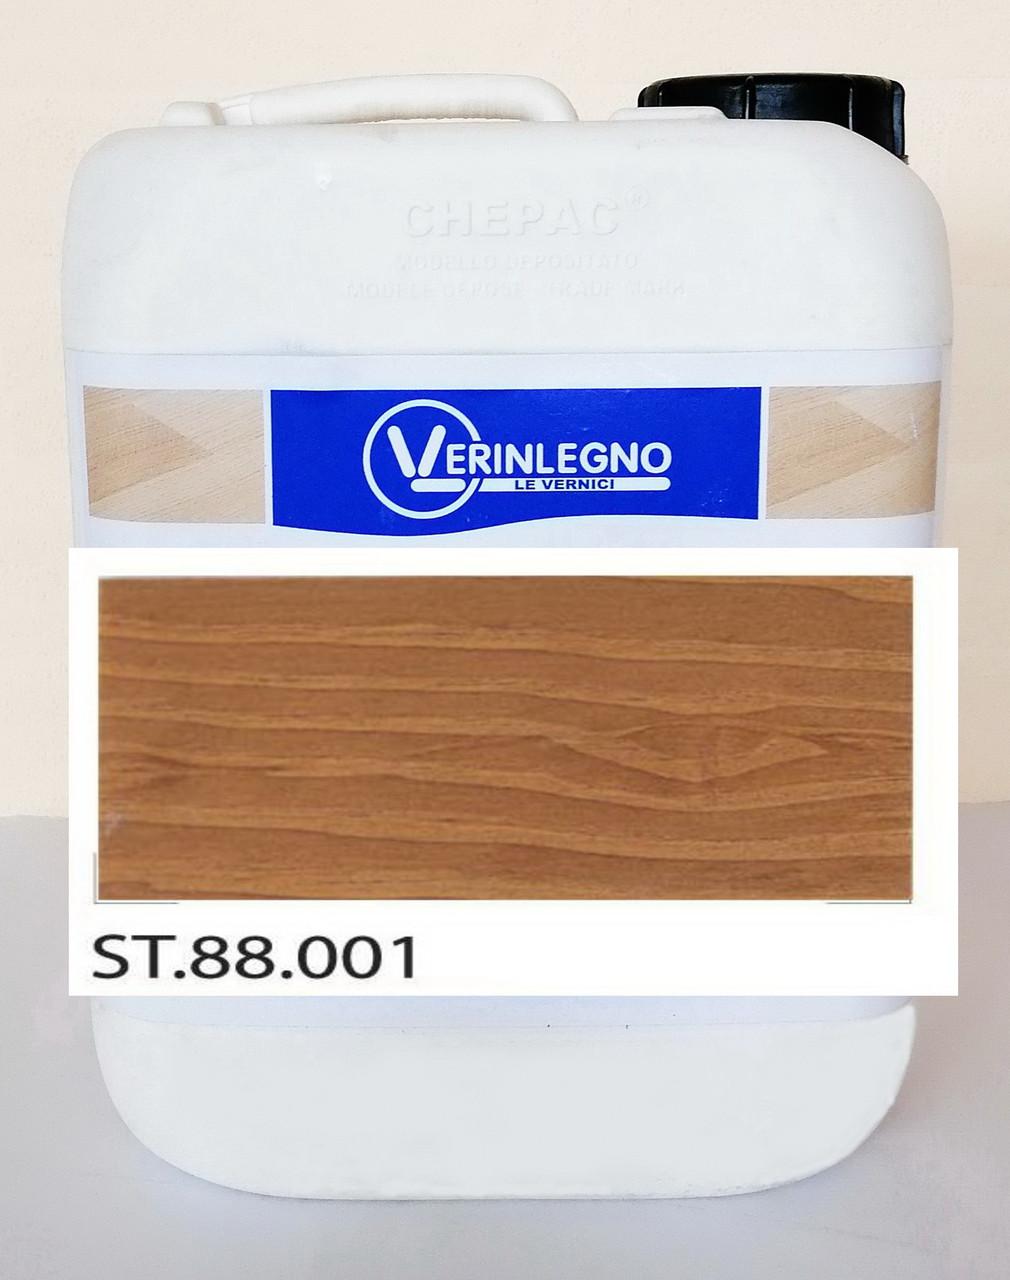 Краситель (морилка, бейц)  для древесины VERINLEGNO ST.88.001, тара: 1л.